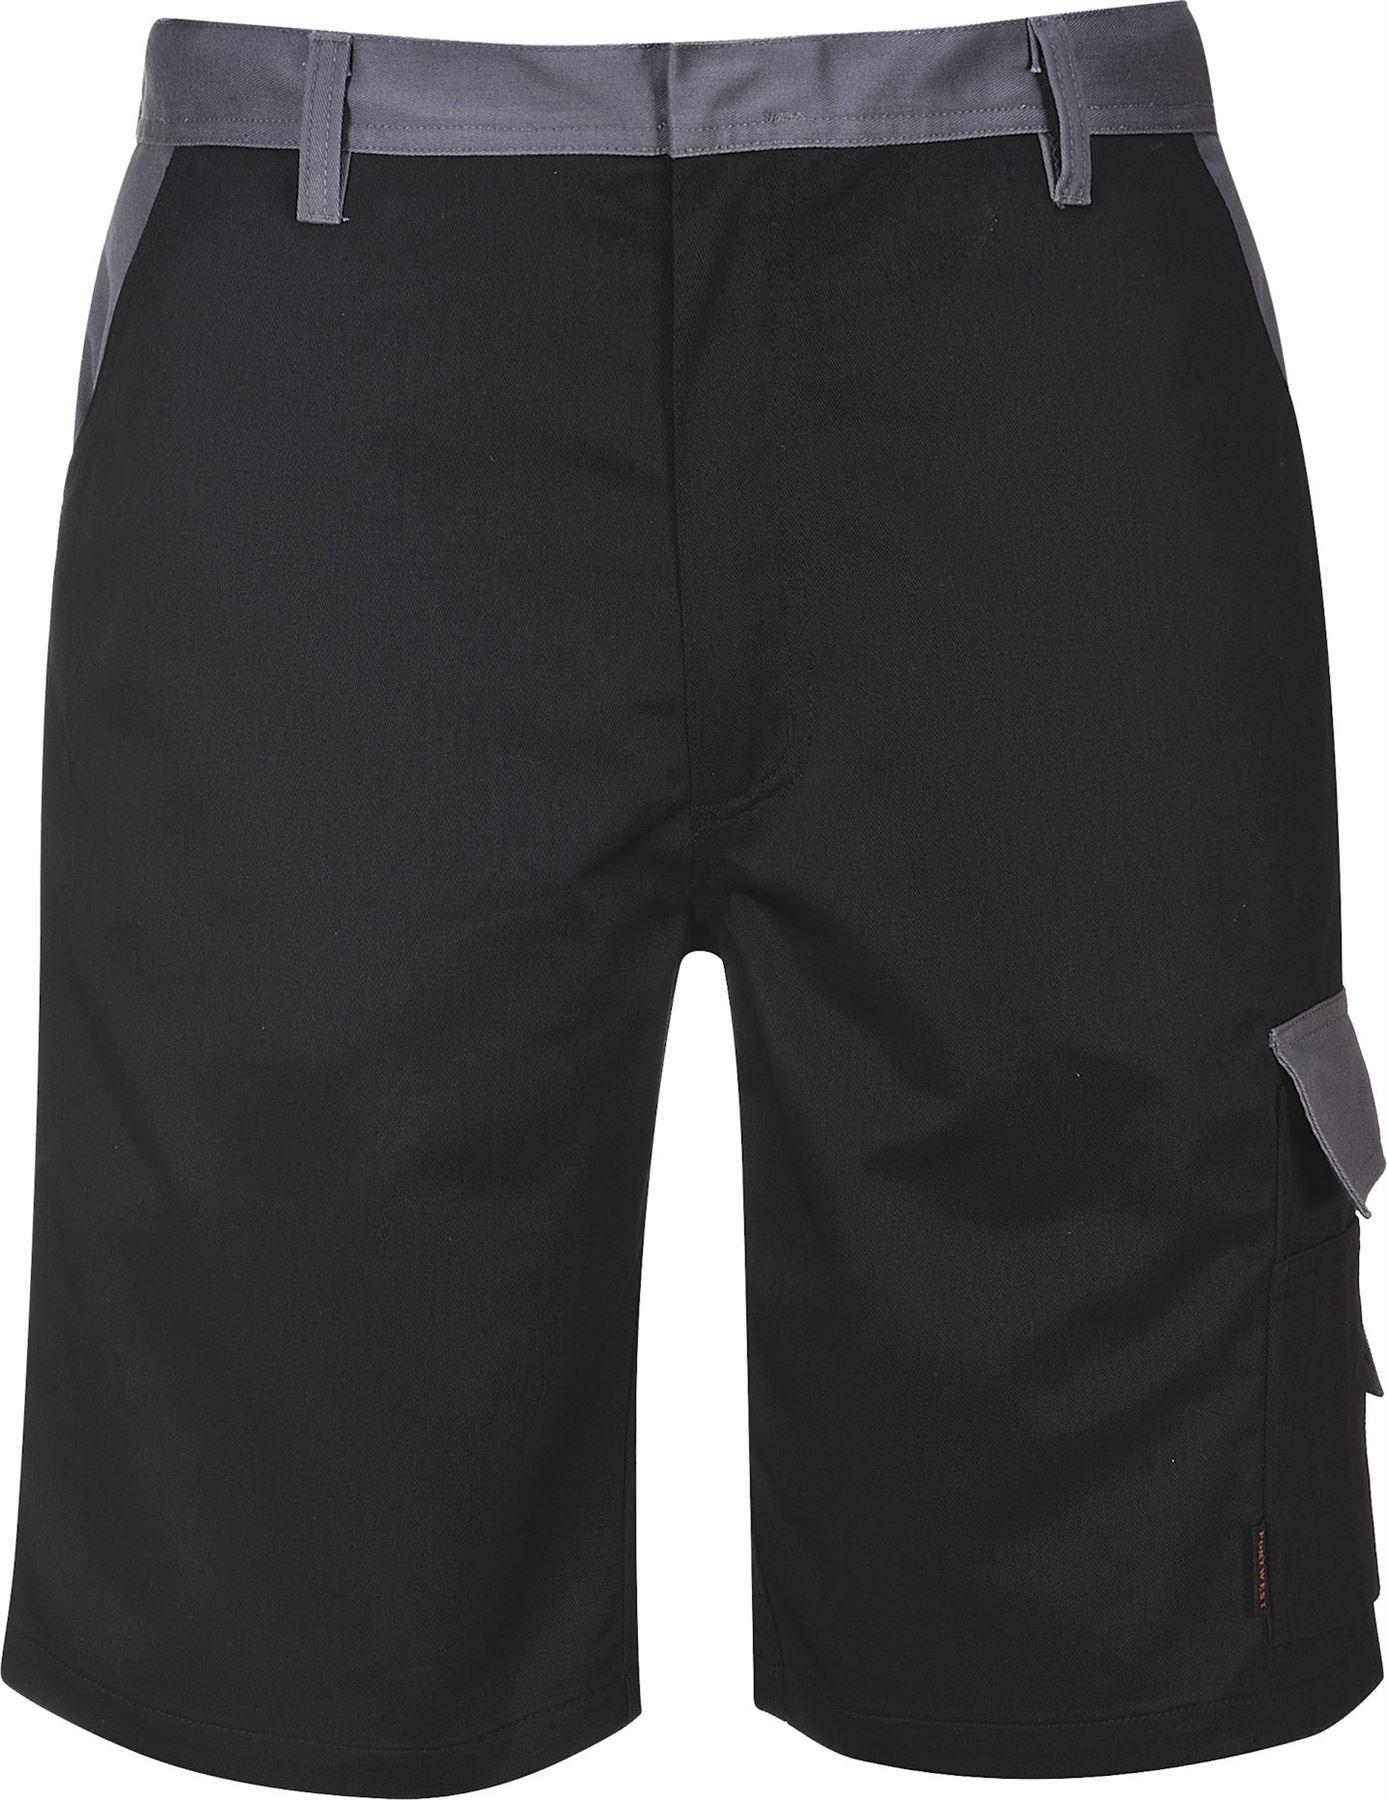 Portwest Cologne Shorts Combat Cargo Pockets Elastic Back Workwear TX37